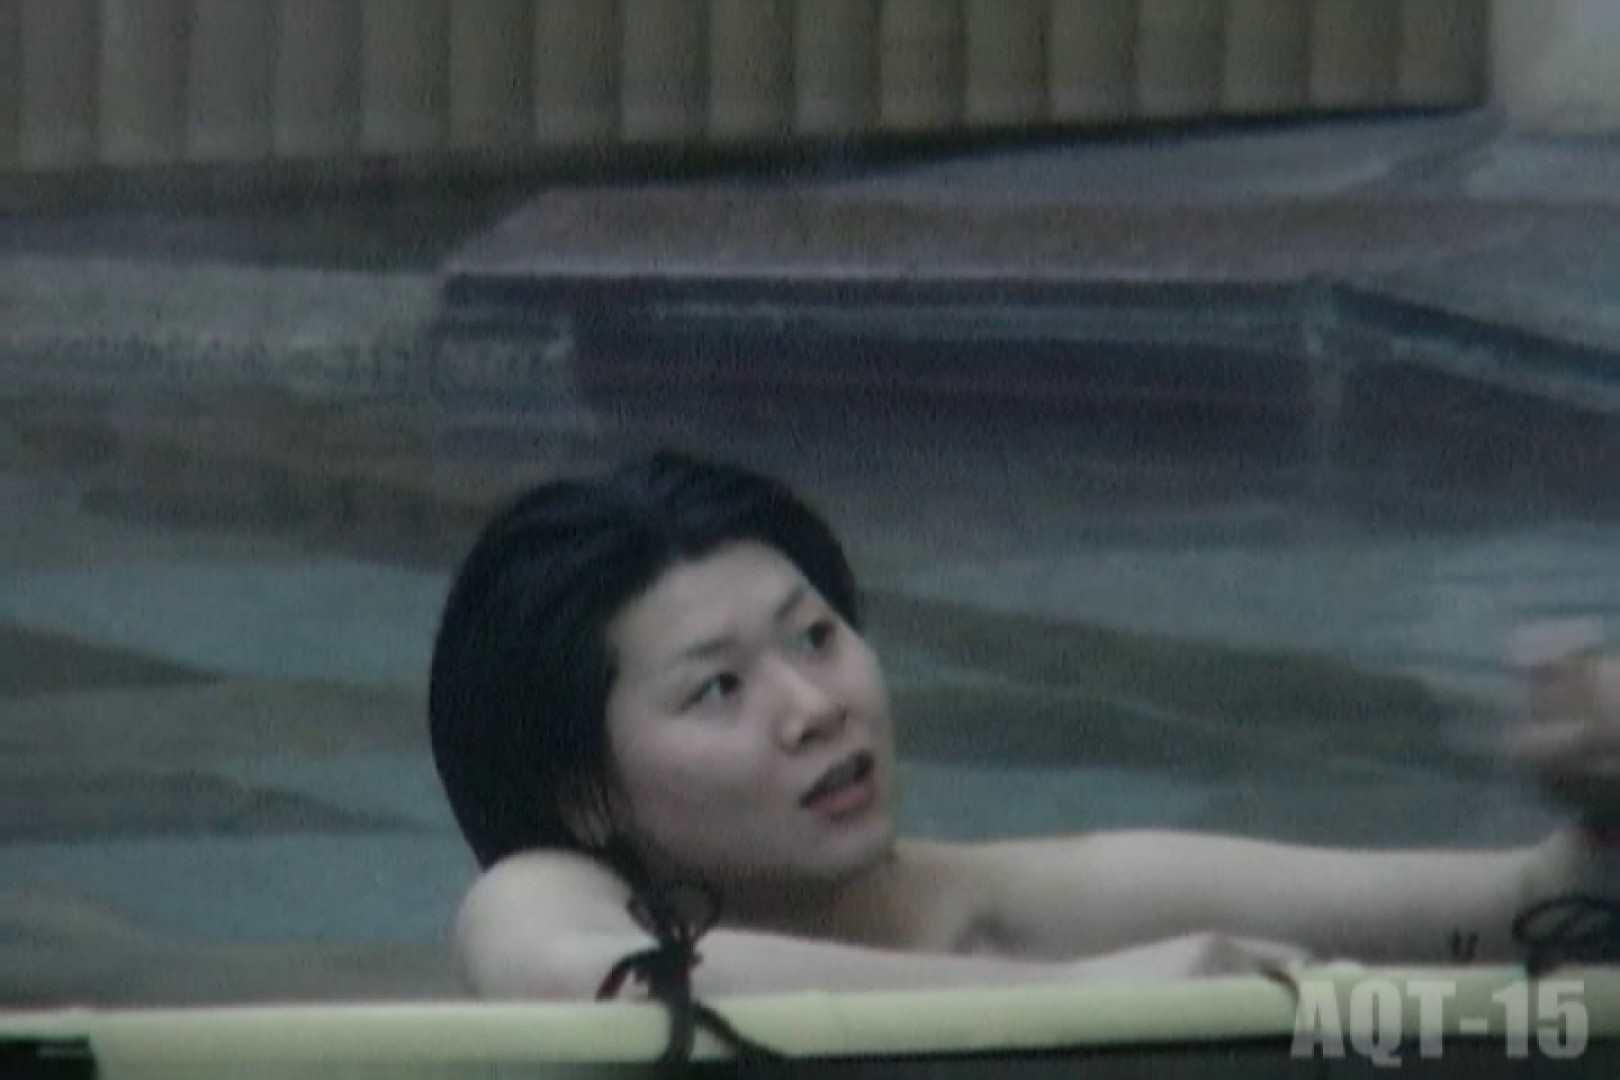 Aquaな露天風呂Vol.837 盗撮映像  107Pix 70